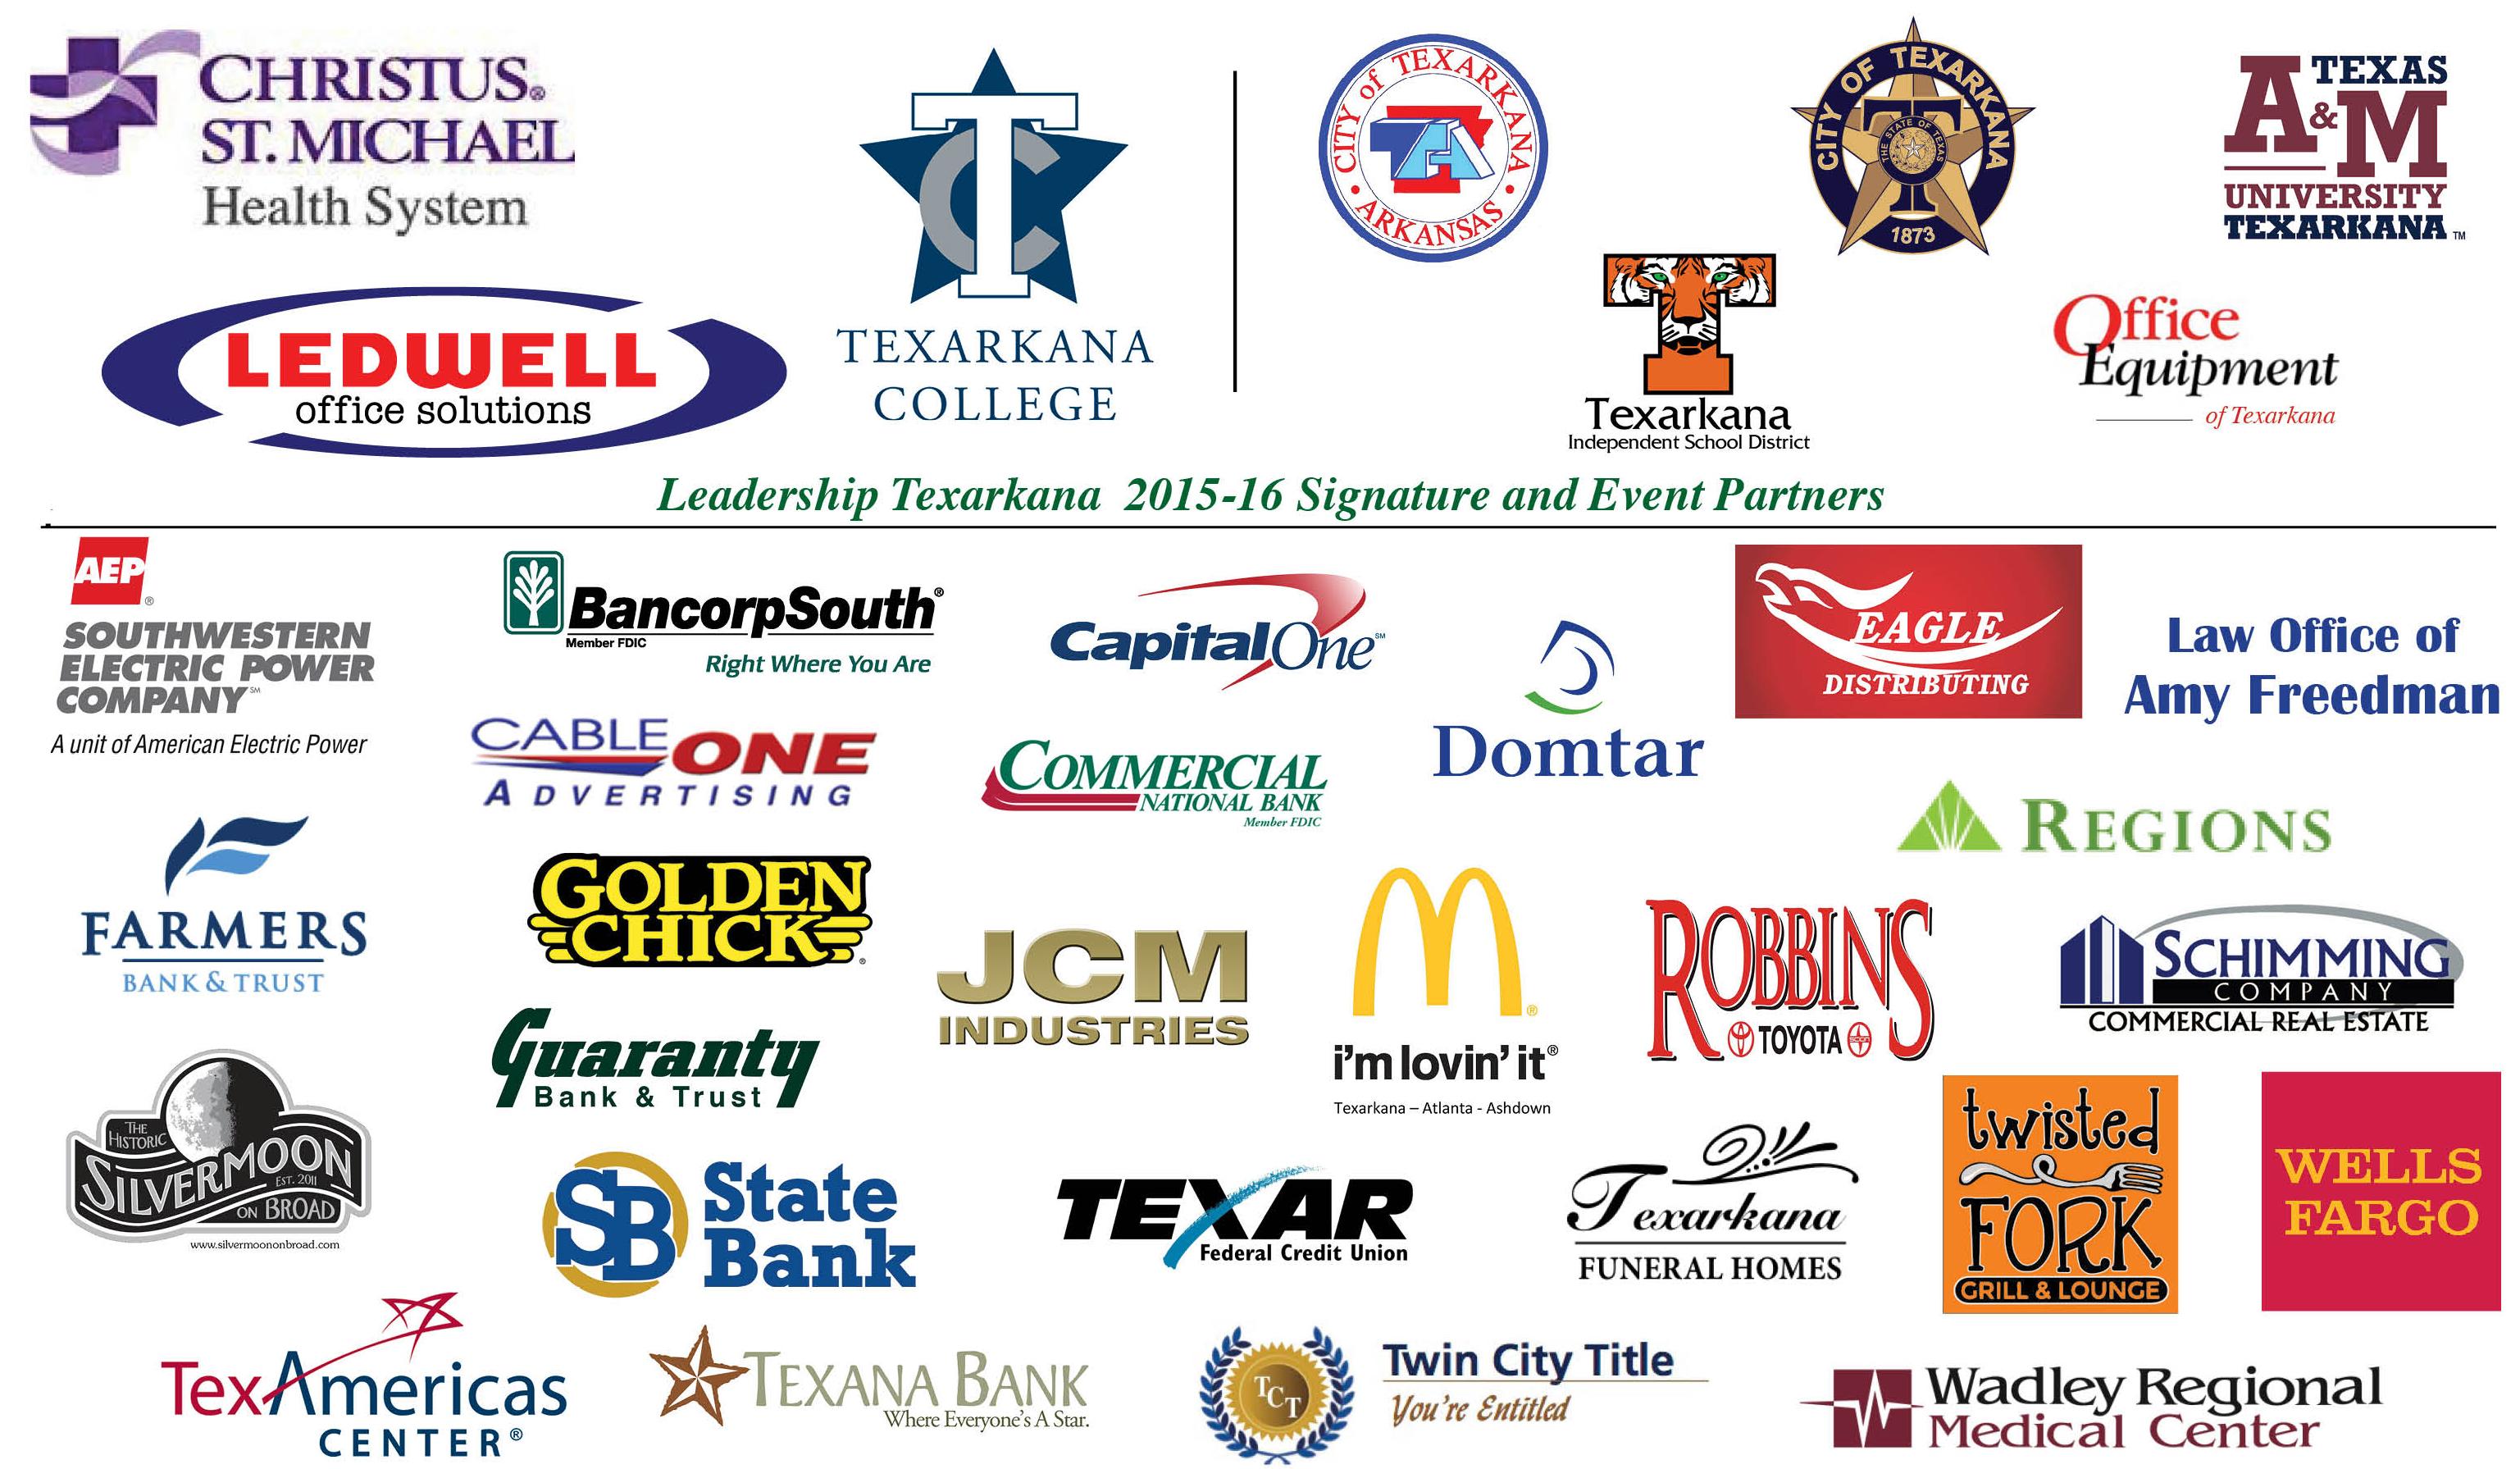 Sponsoring Partners